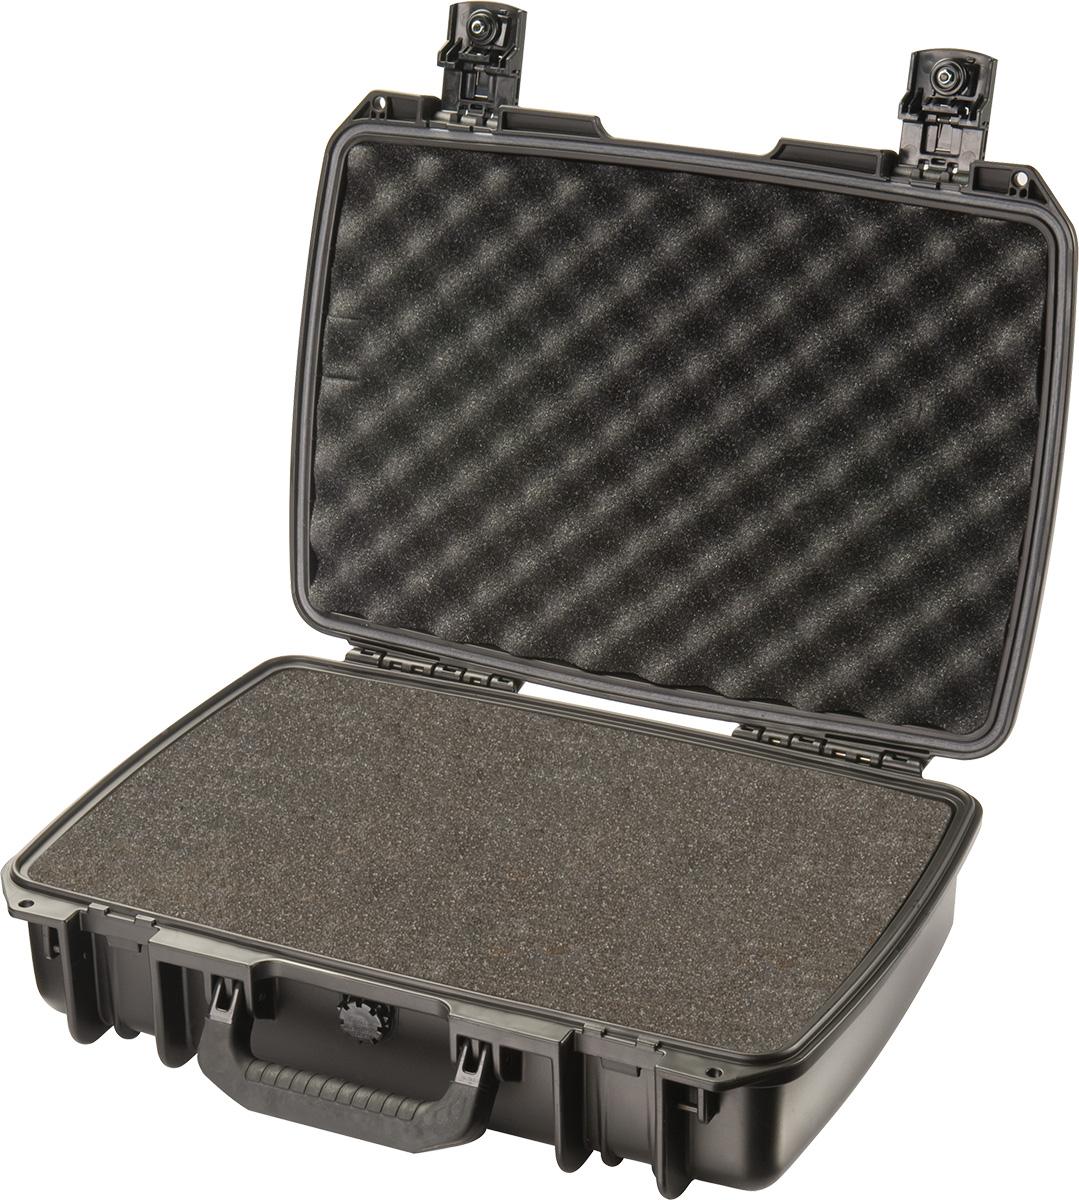 pelican im2370 pelican im2370 padded computer laptop case